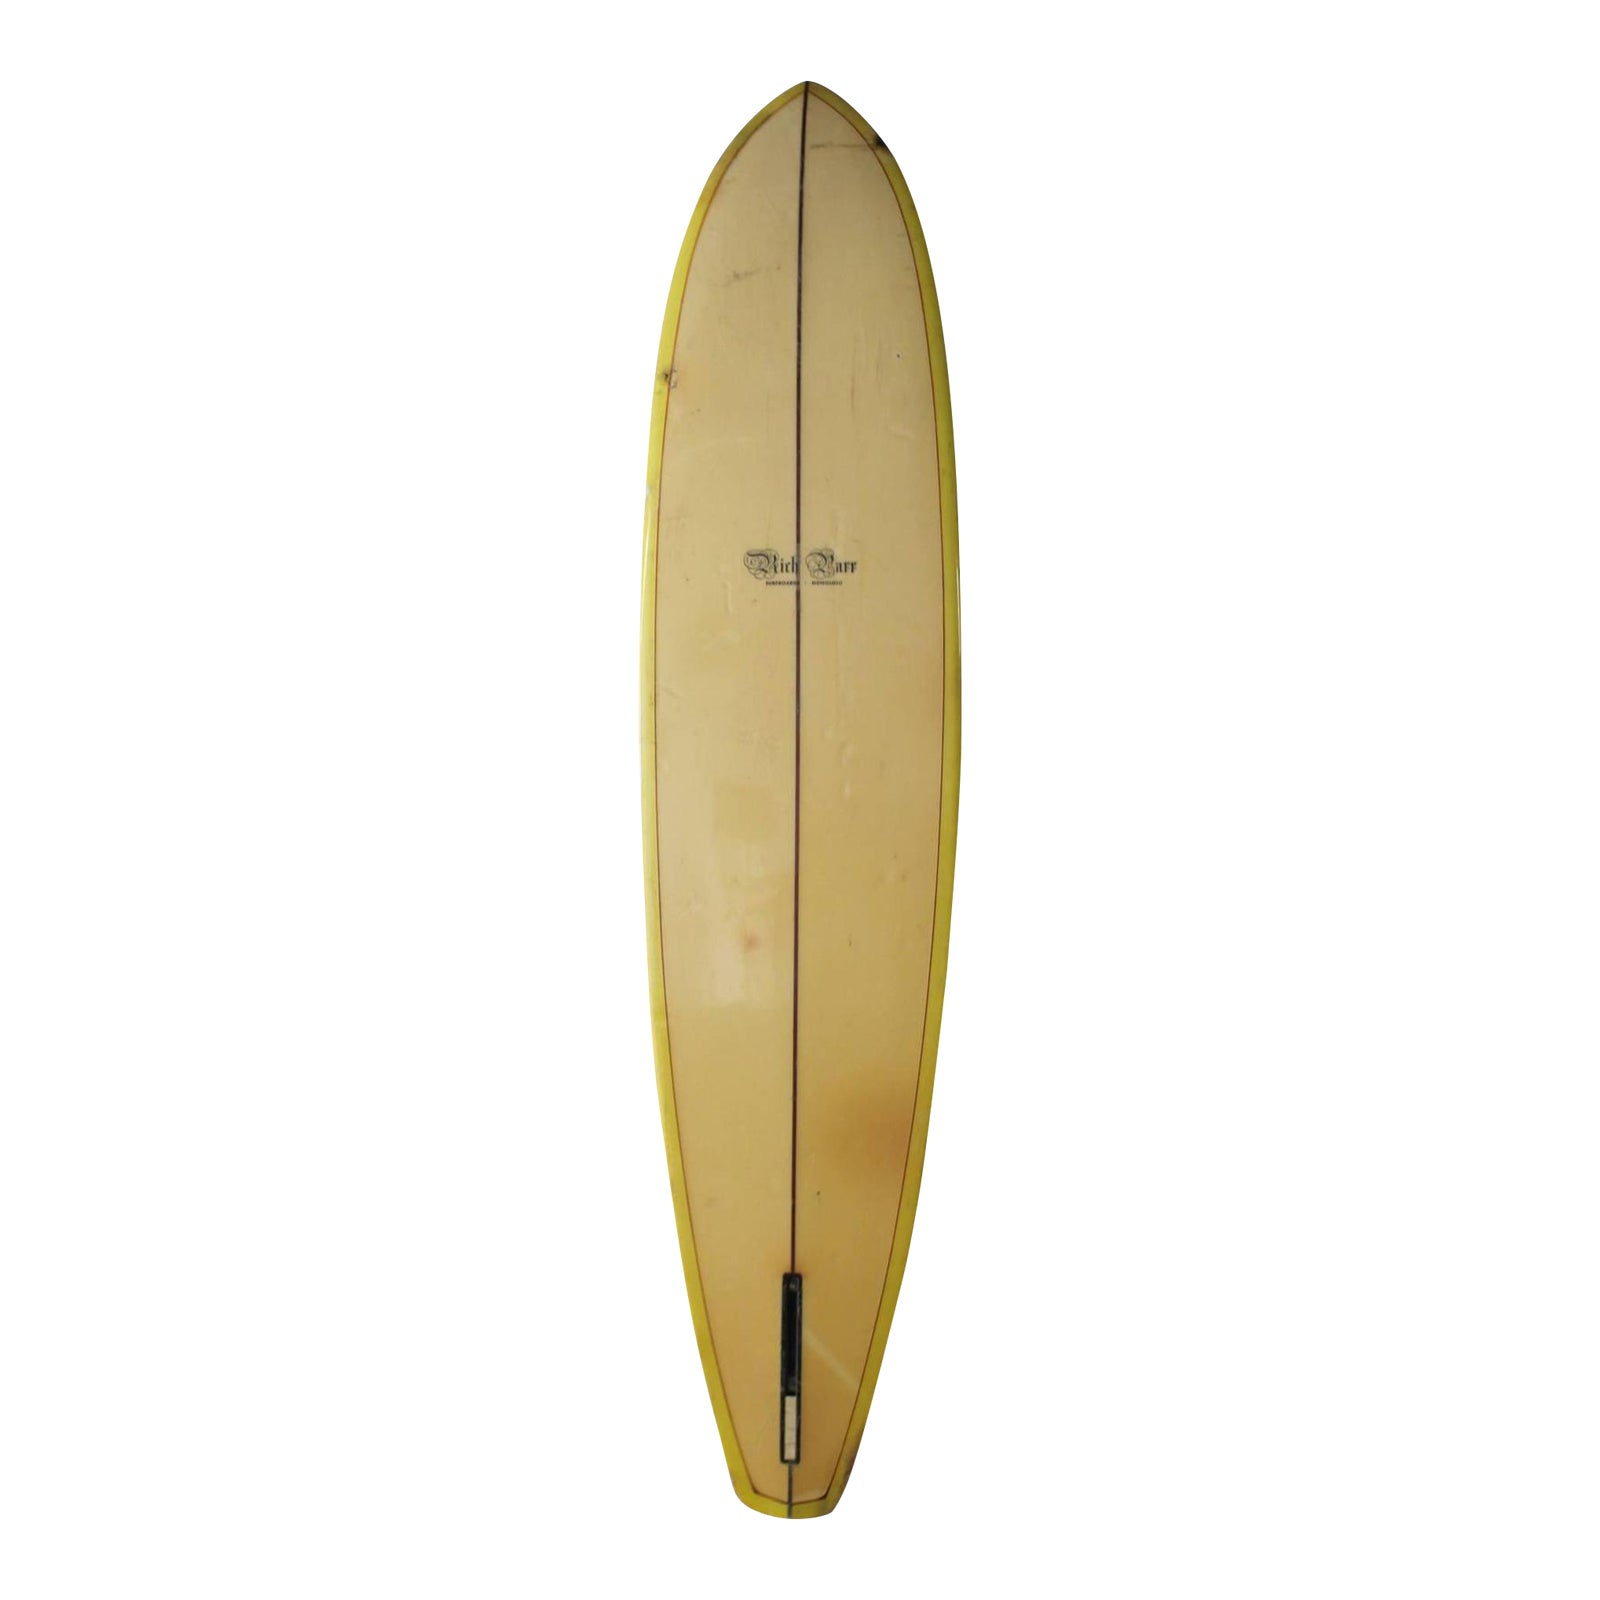 Vintage Rich Parr Surfboards, Honolulu Surfboard | Chairish